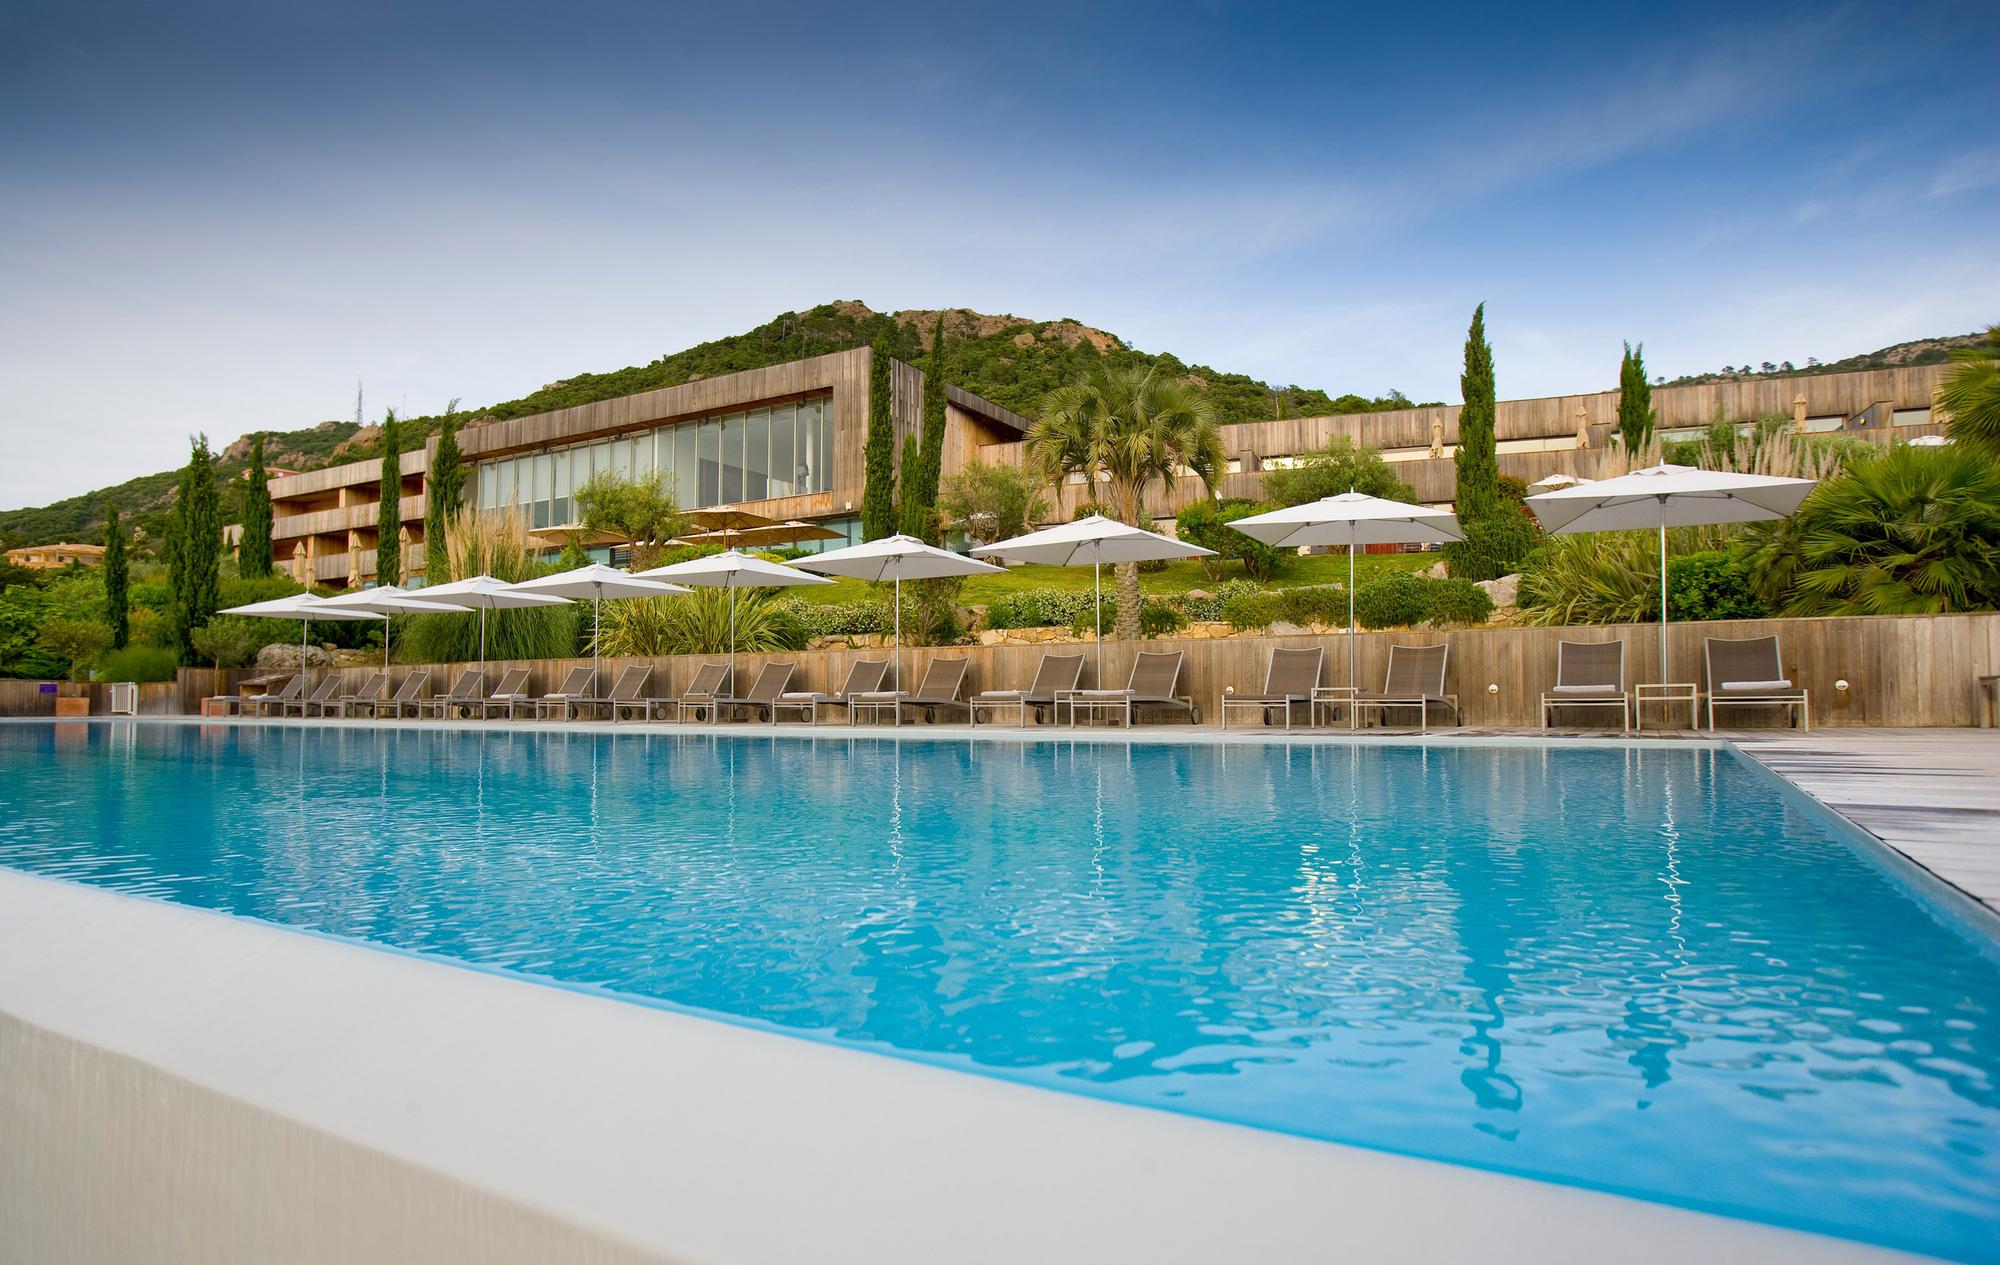 casadelmar-hotel-jean-fran-ois-bodin_-11